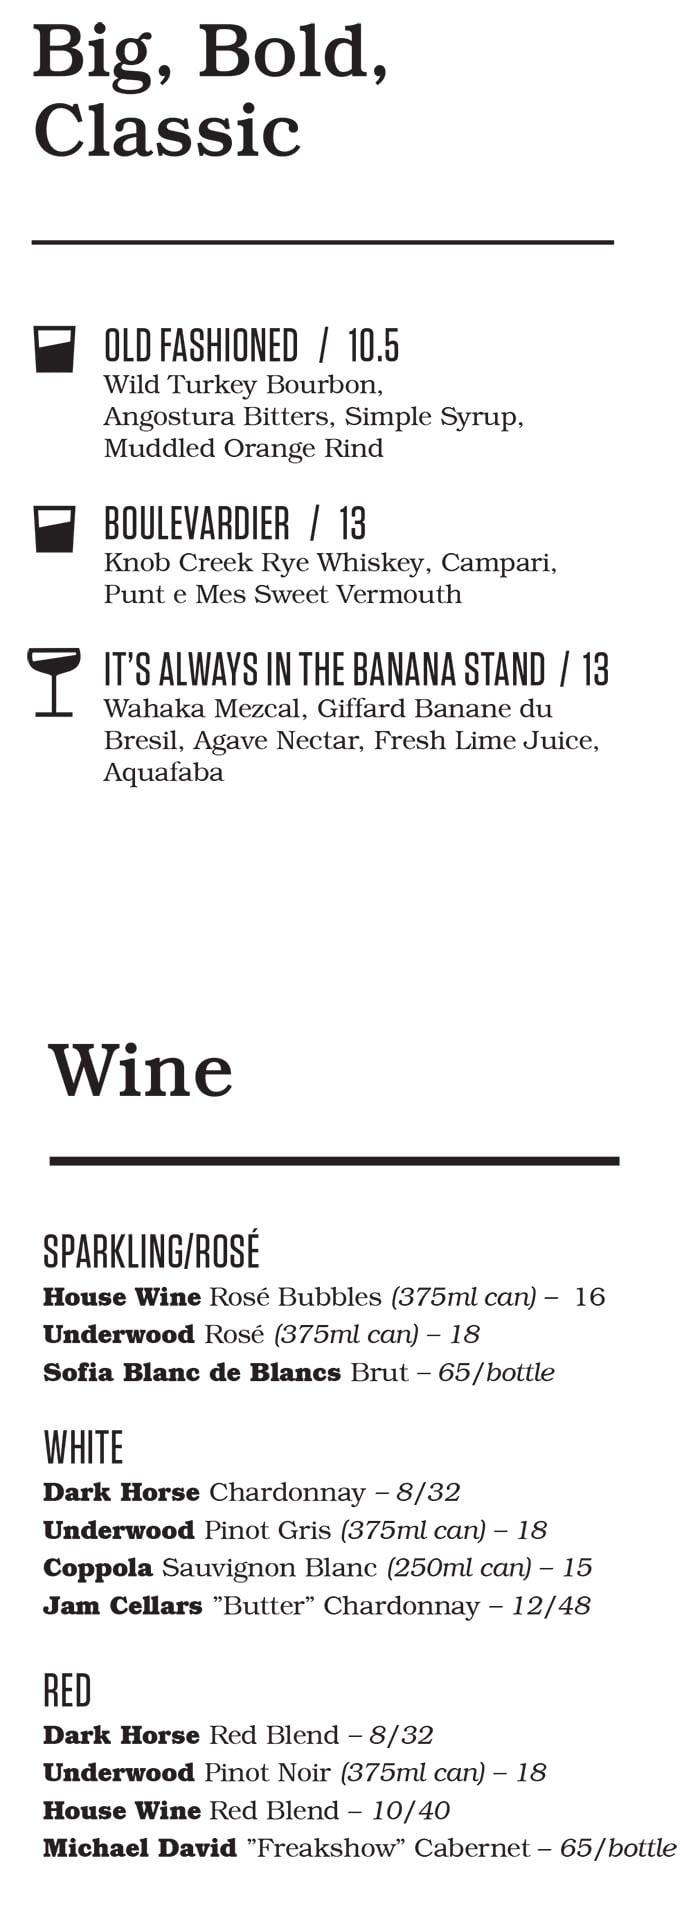 Punch Bowl Social Salt Lake City bar menu - more cocktails, wine